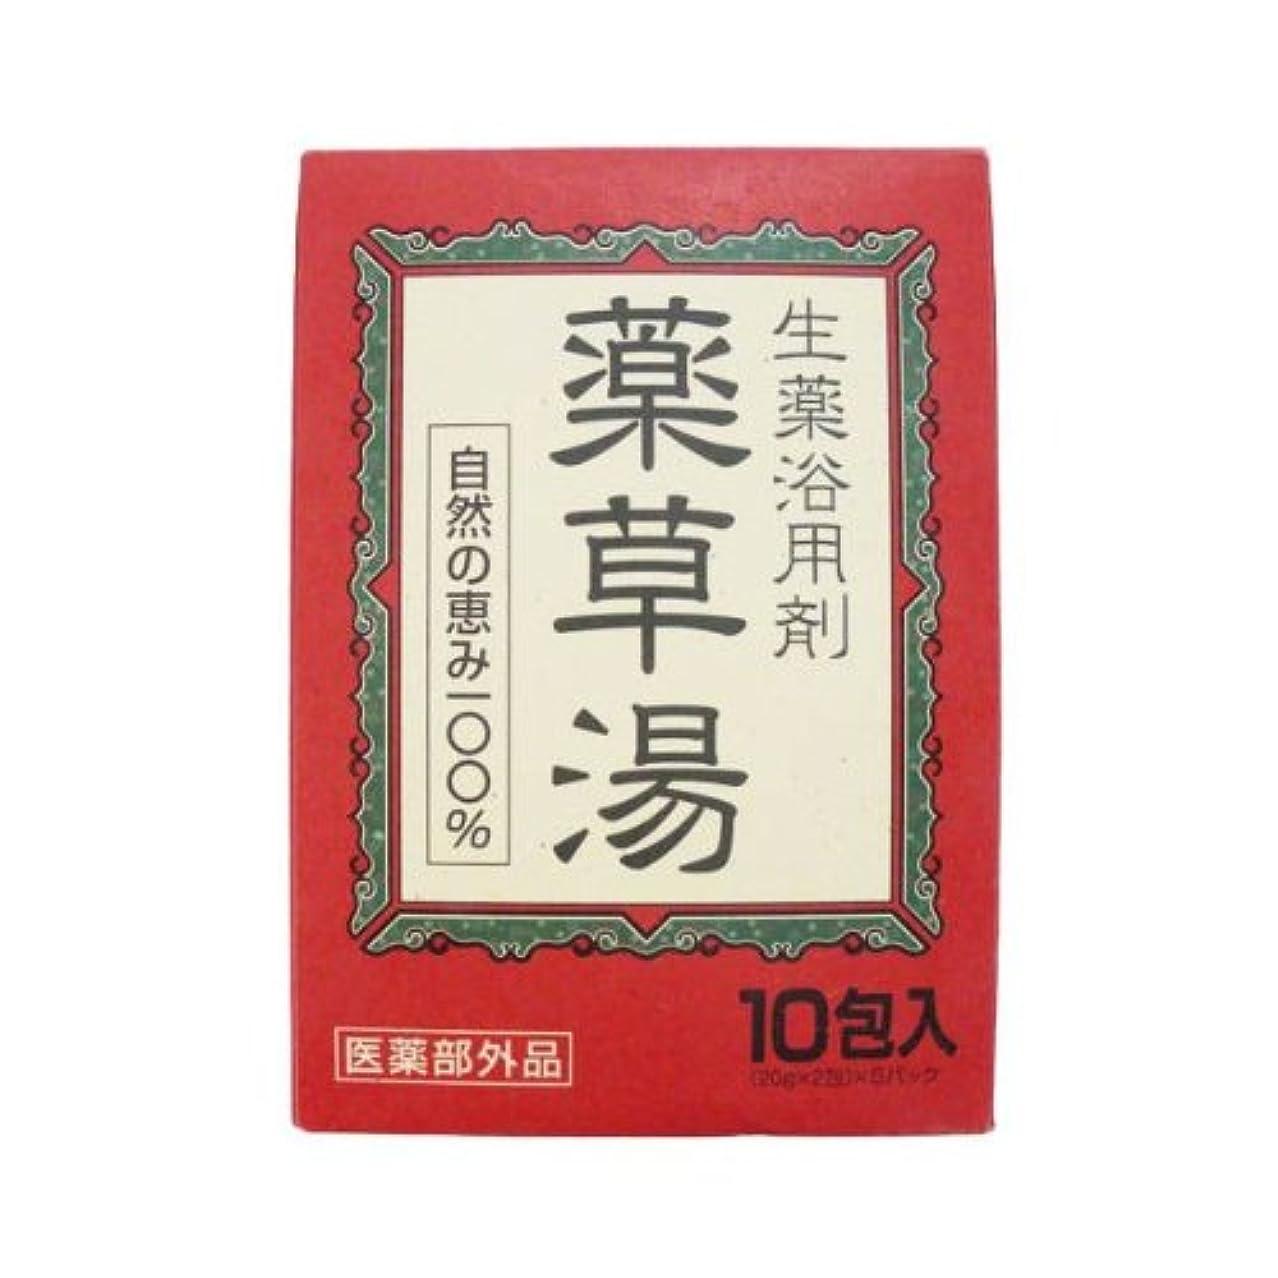 失業脅迫約VVN生薬入浴剤薬草湯10包×(20セット)